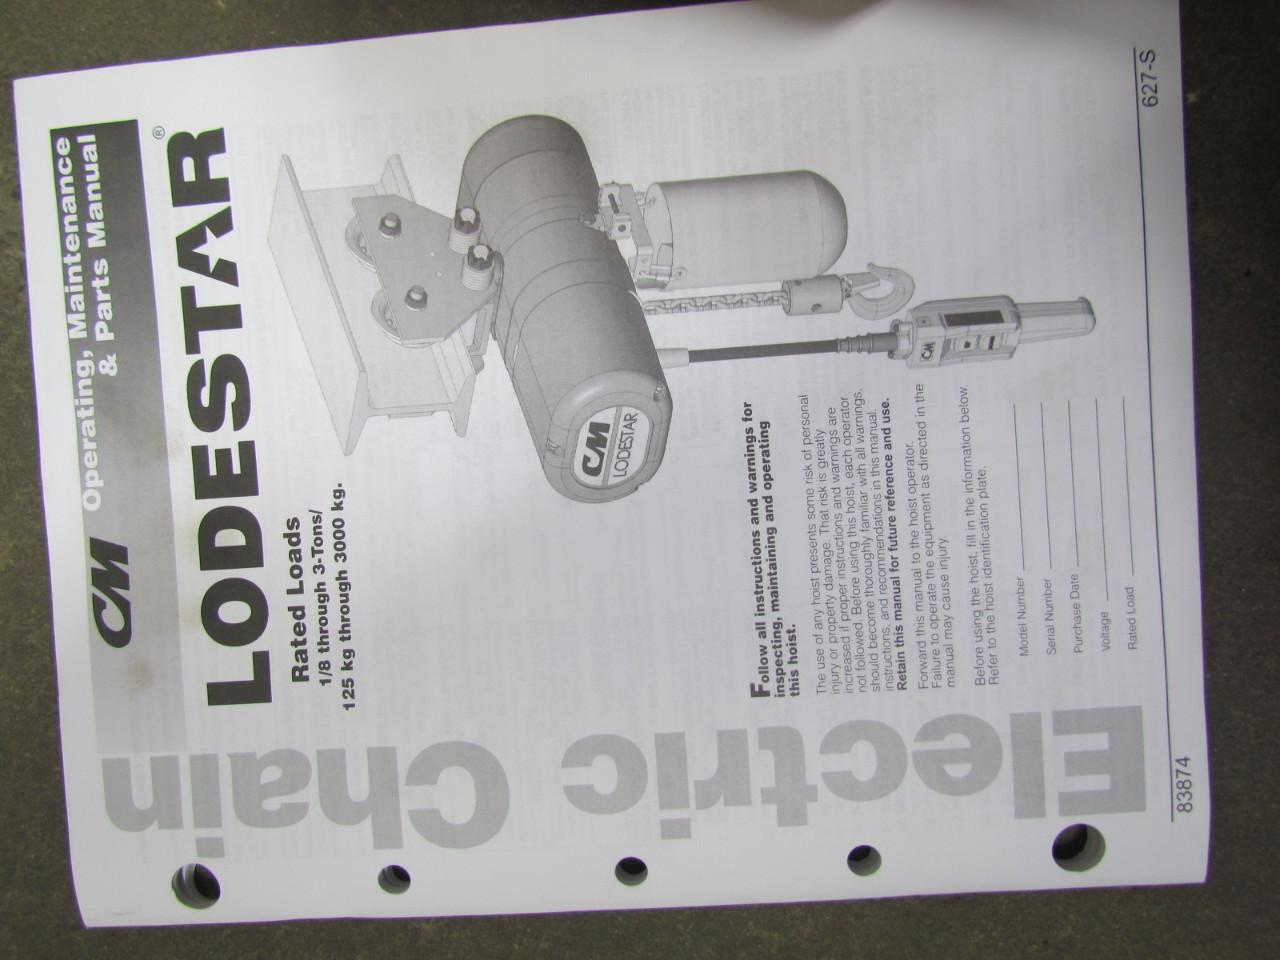 55744 cm lodestar j new 1 2 ton electric chain hoist 32fpm 15lift 110 120volt 12?resize=665%2C499 rr2 cm lodestar wiring diagram conventional fire alarm wiring  at soozxer.org